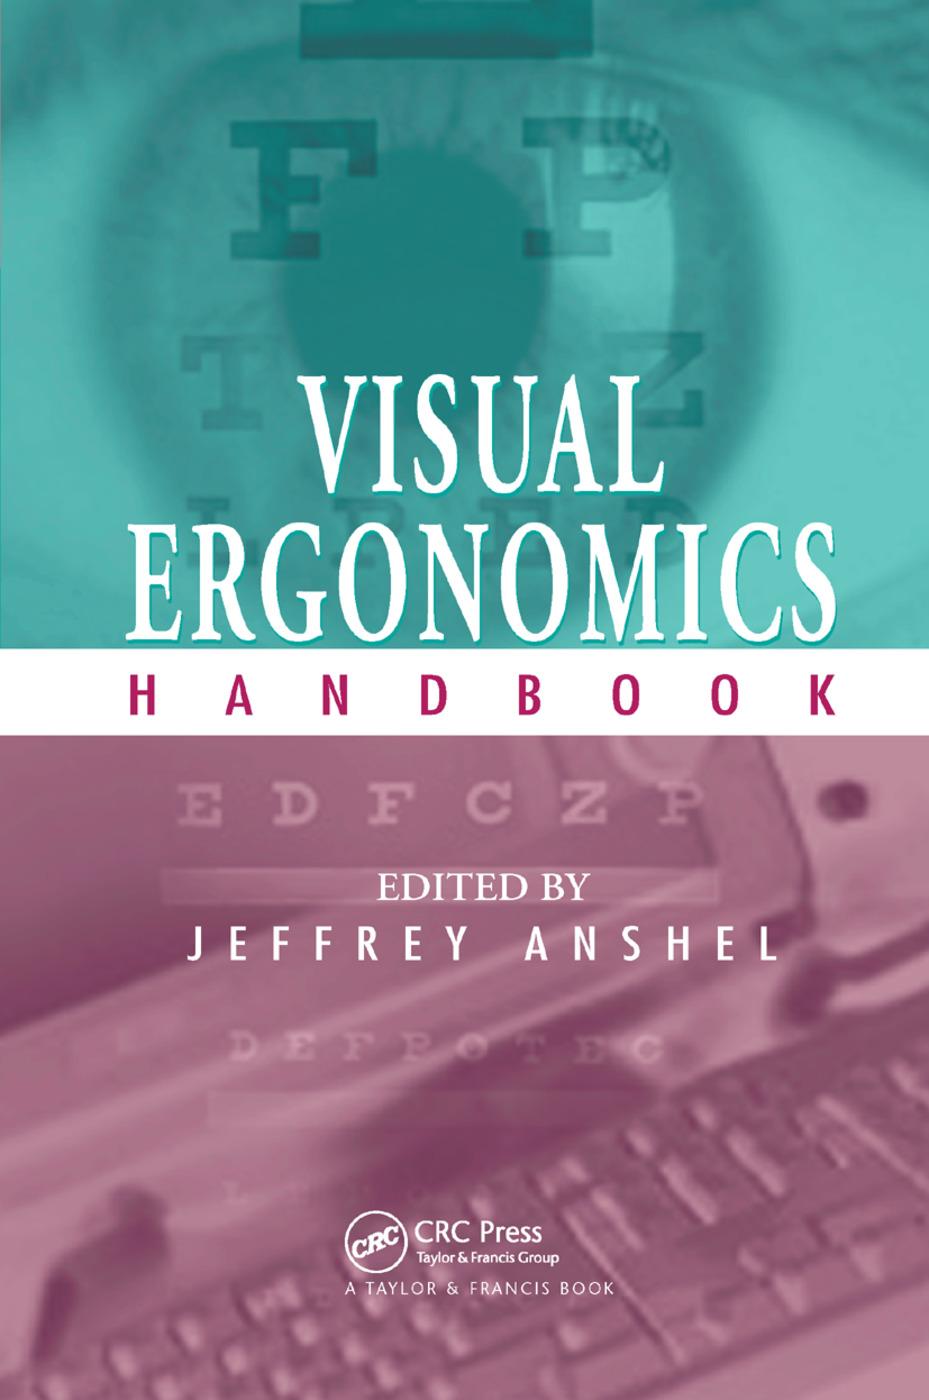 Visual Ergonomics Handbook: 1st Edition (Paperback) book cover